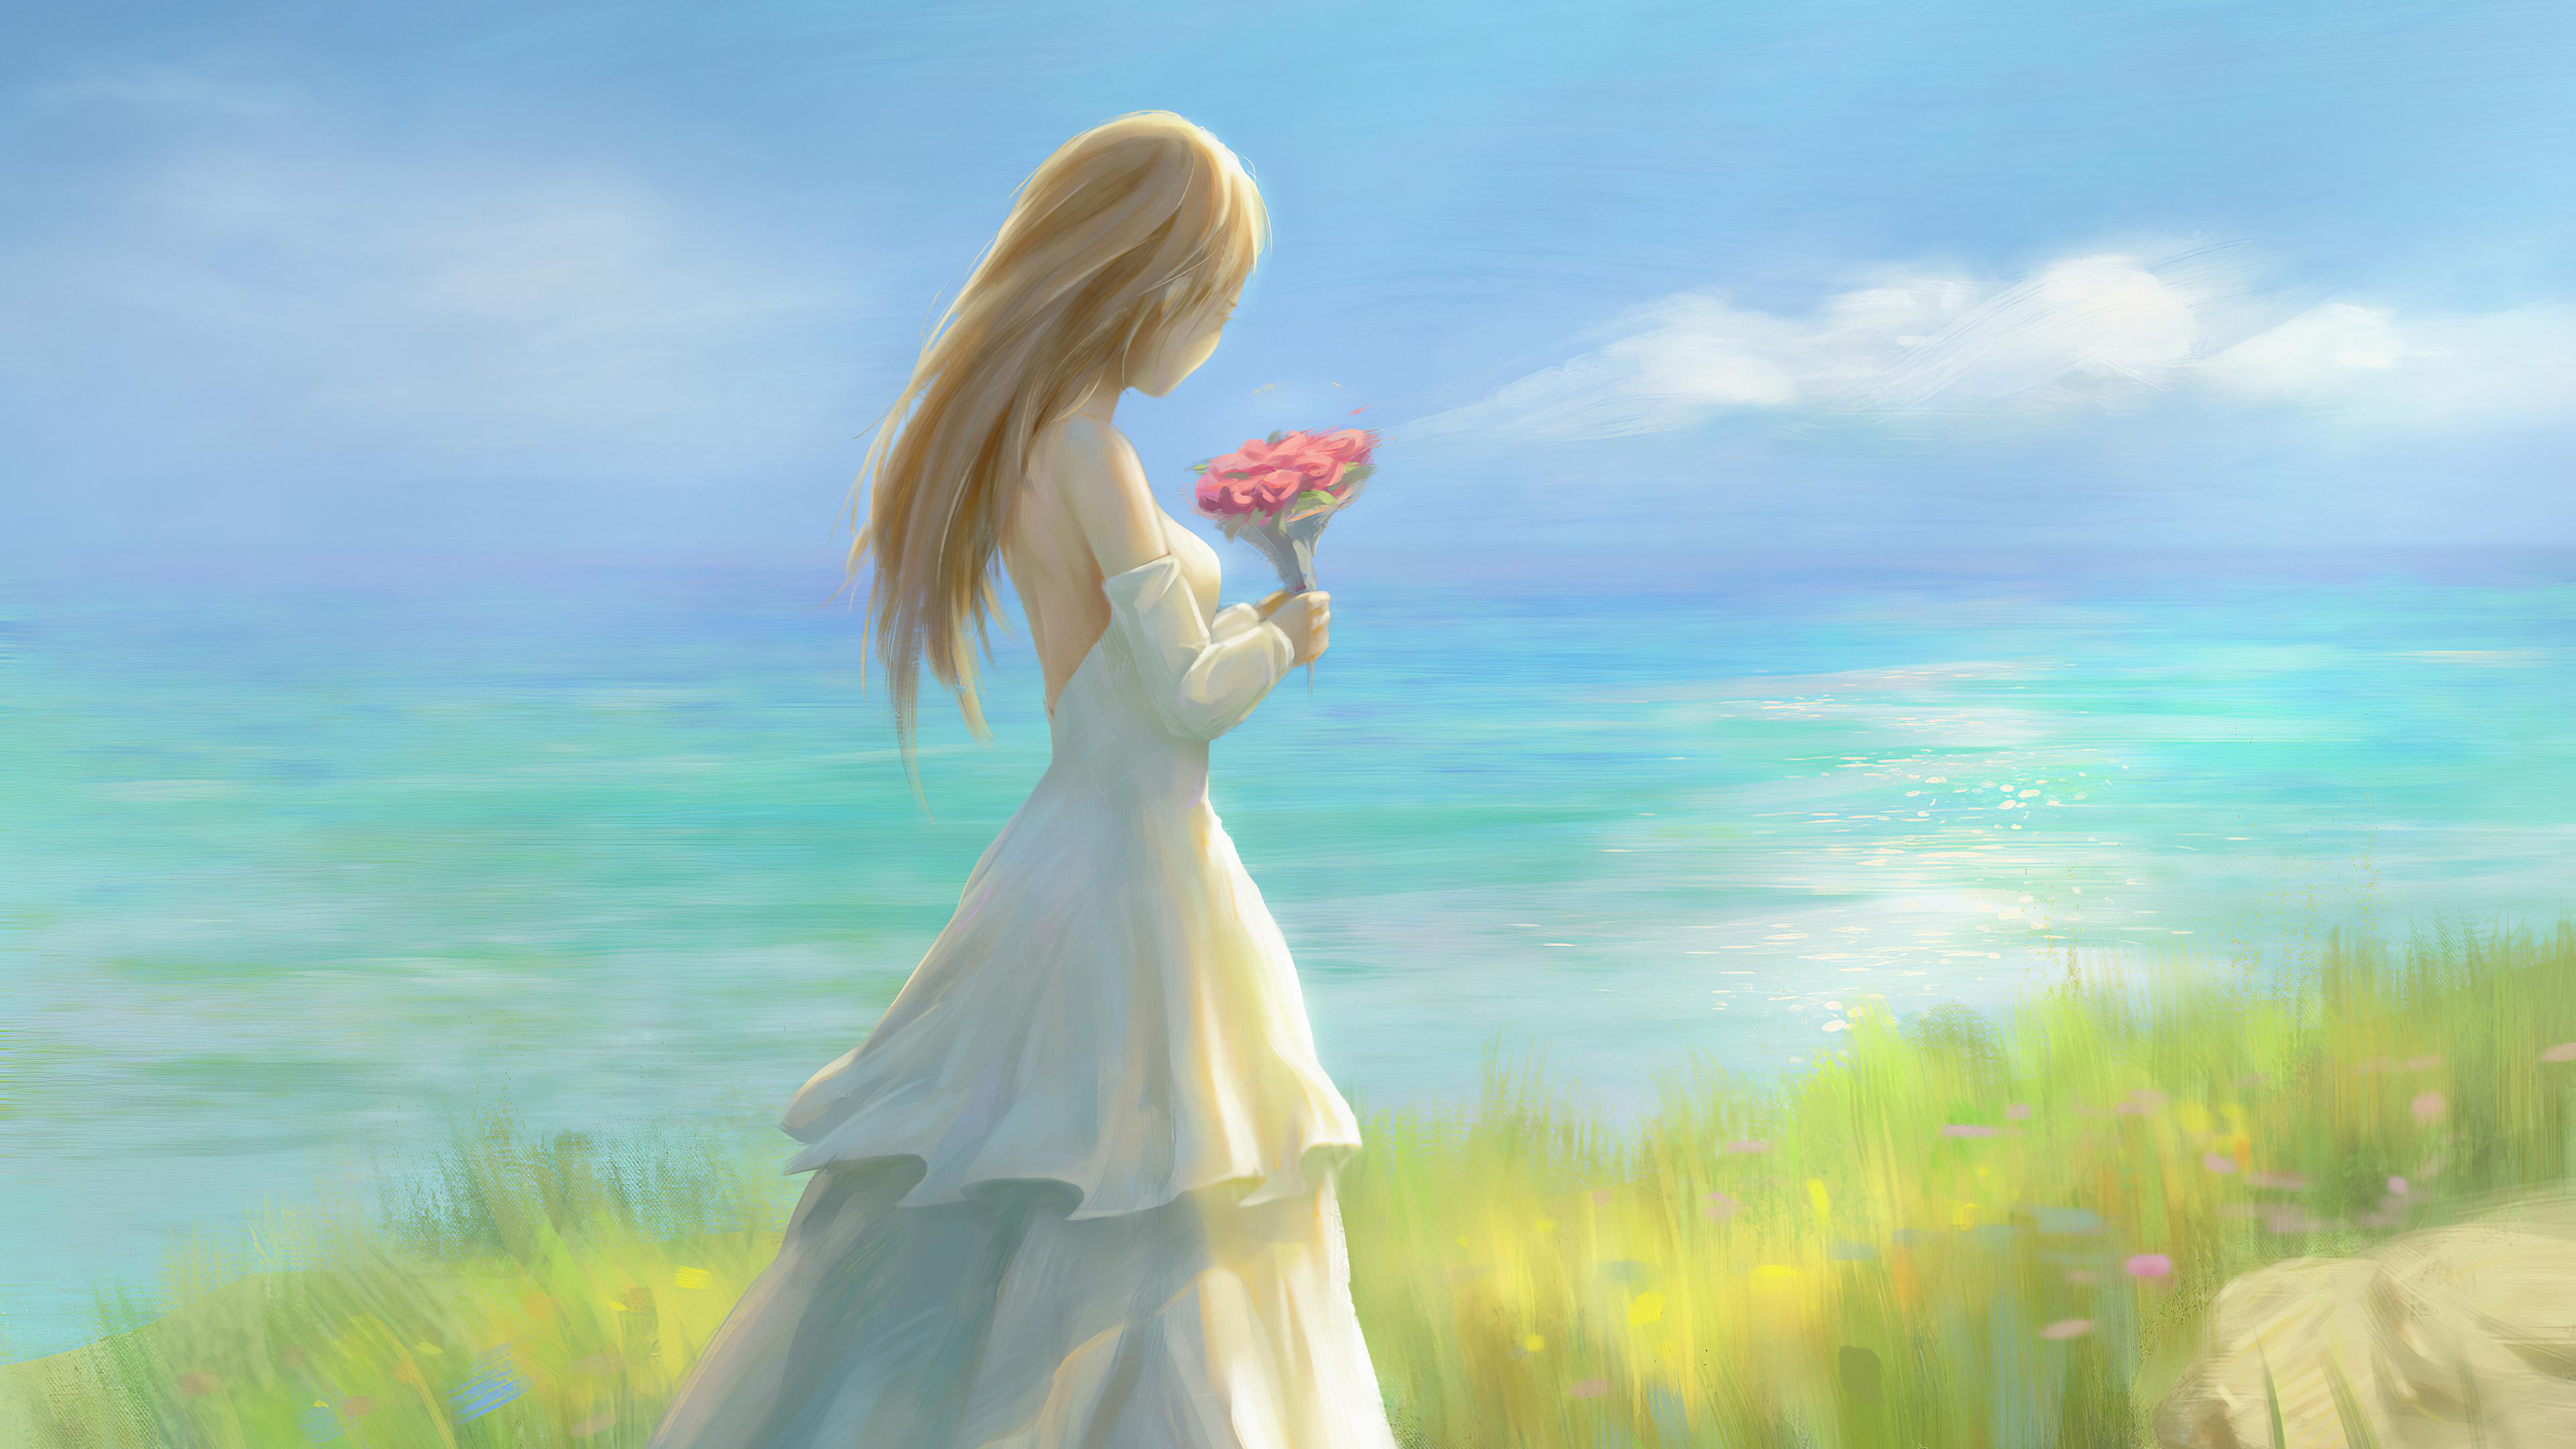 wedding blessing 1574940726 - Wedding Blessing -